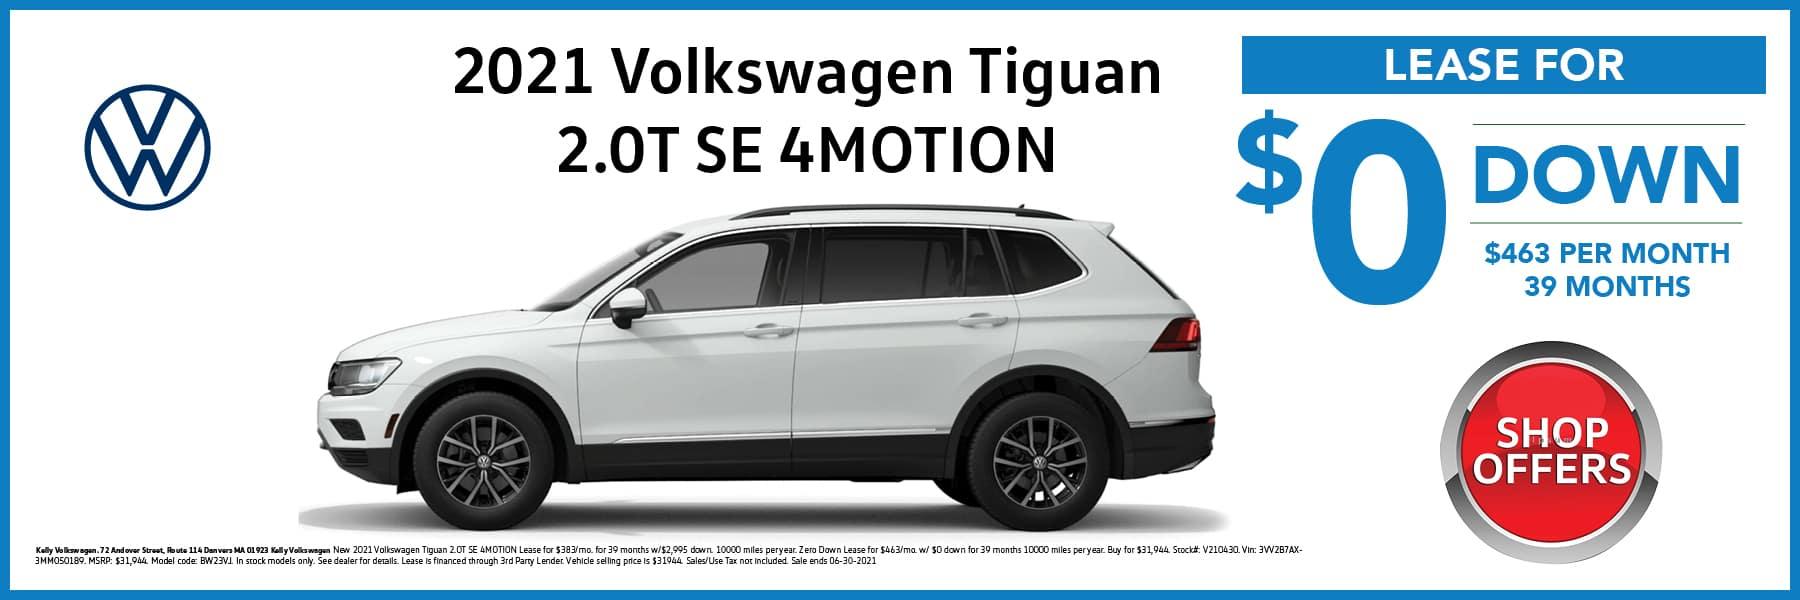 2021 Volkswagen Tiguan SE SUV in White Lease Offer Web Slide